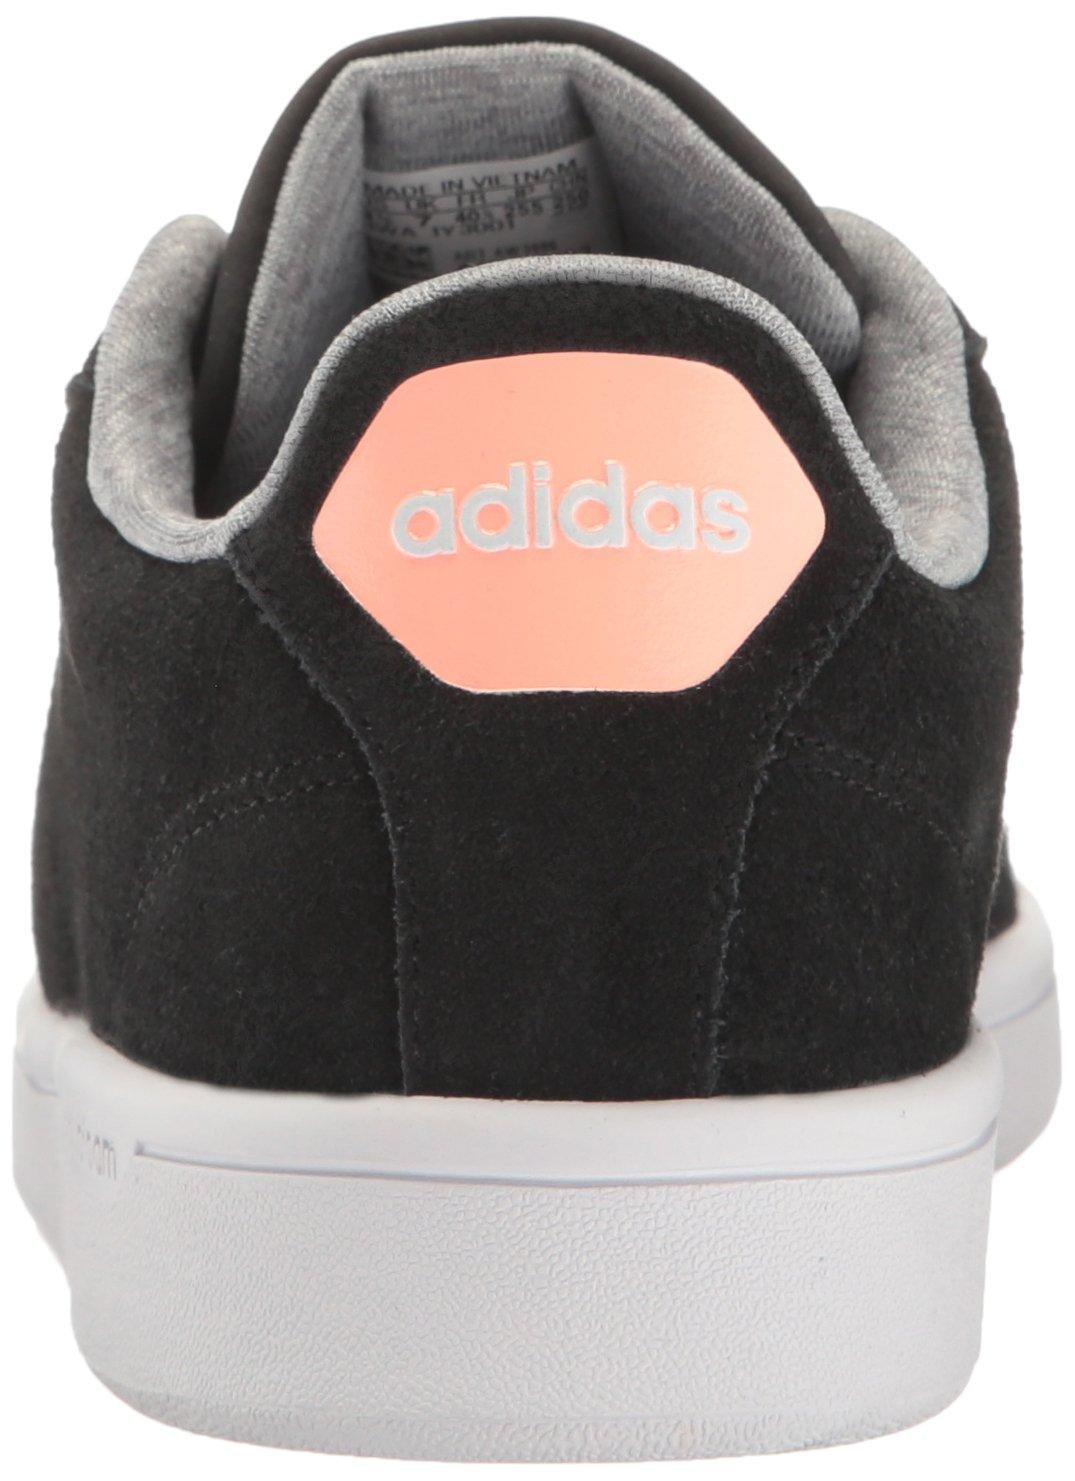 Adidas Women's Cloudfoam M Advantage Clean Fashion Sneaker B01HSIQPLE (7.5 M Cloudfoam US)|Black/Sun Glow 741352